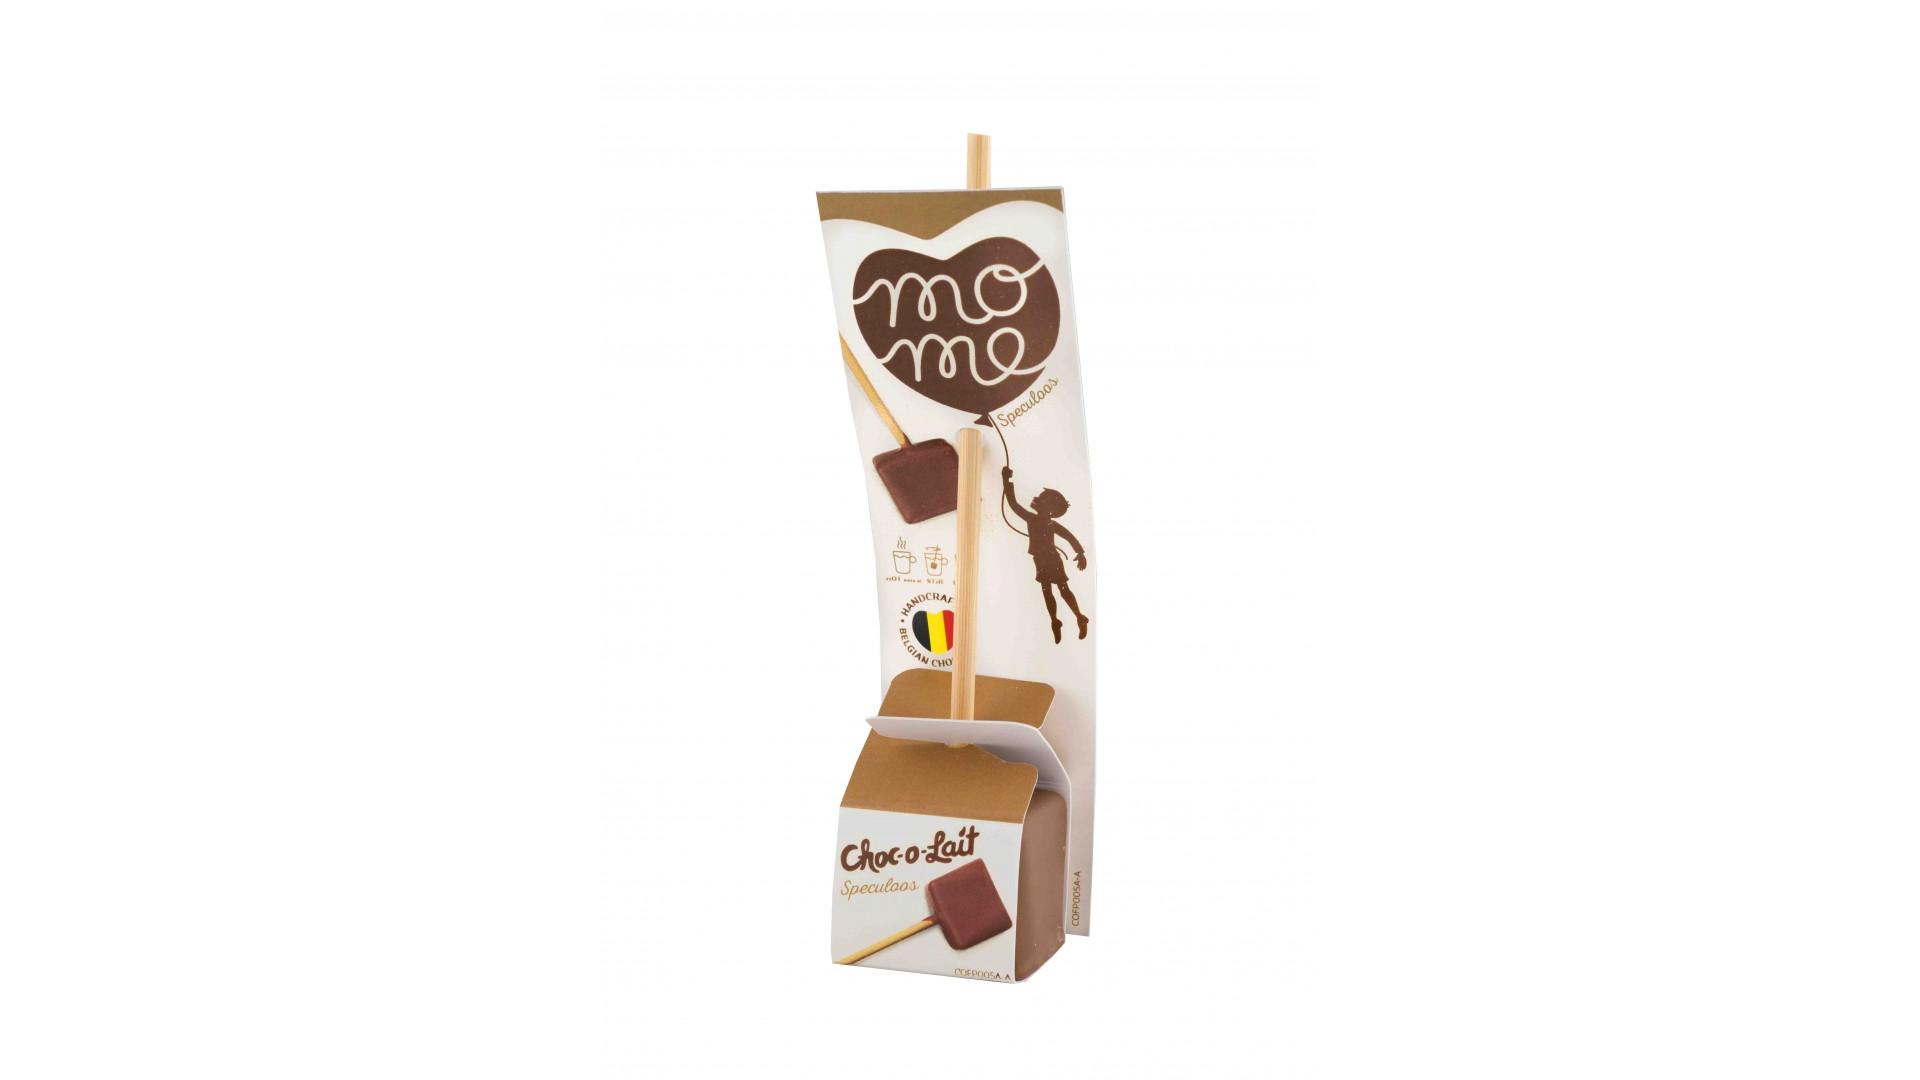 choc-o-lait chocolate